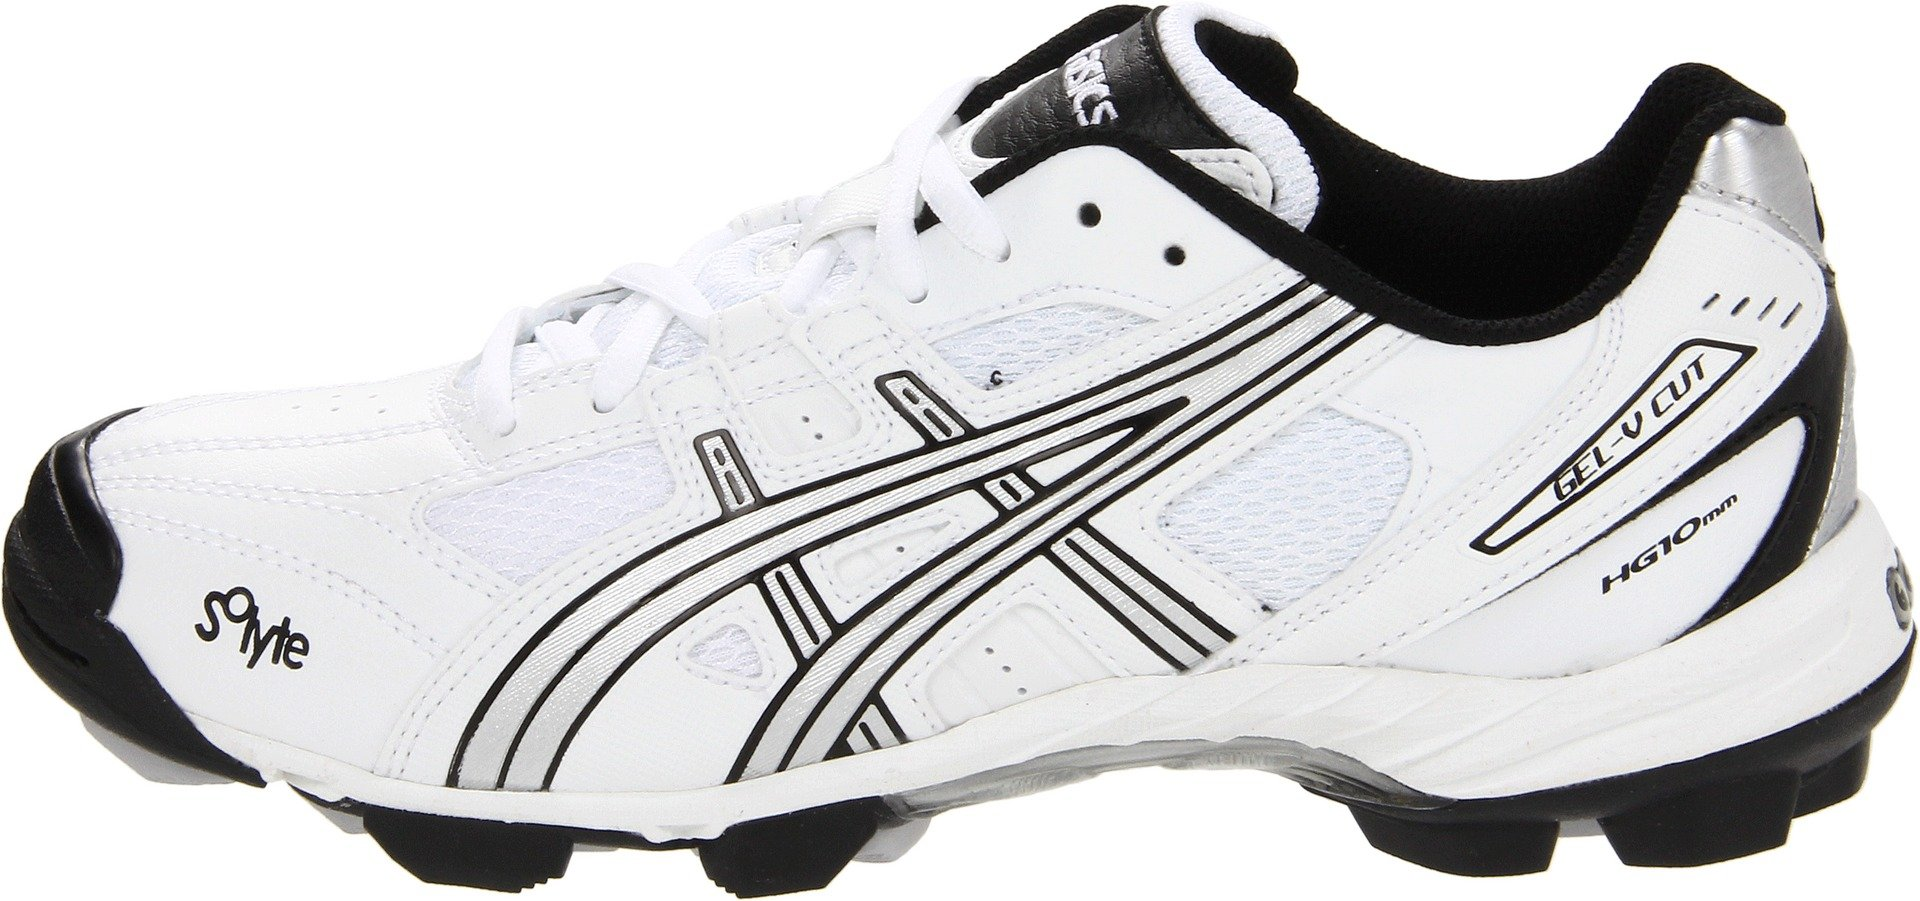 ASICS Women's GEL-V Cut Field Shoe,White/Silver/Black,12 M by ASICS (Image #5)